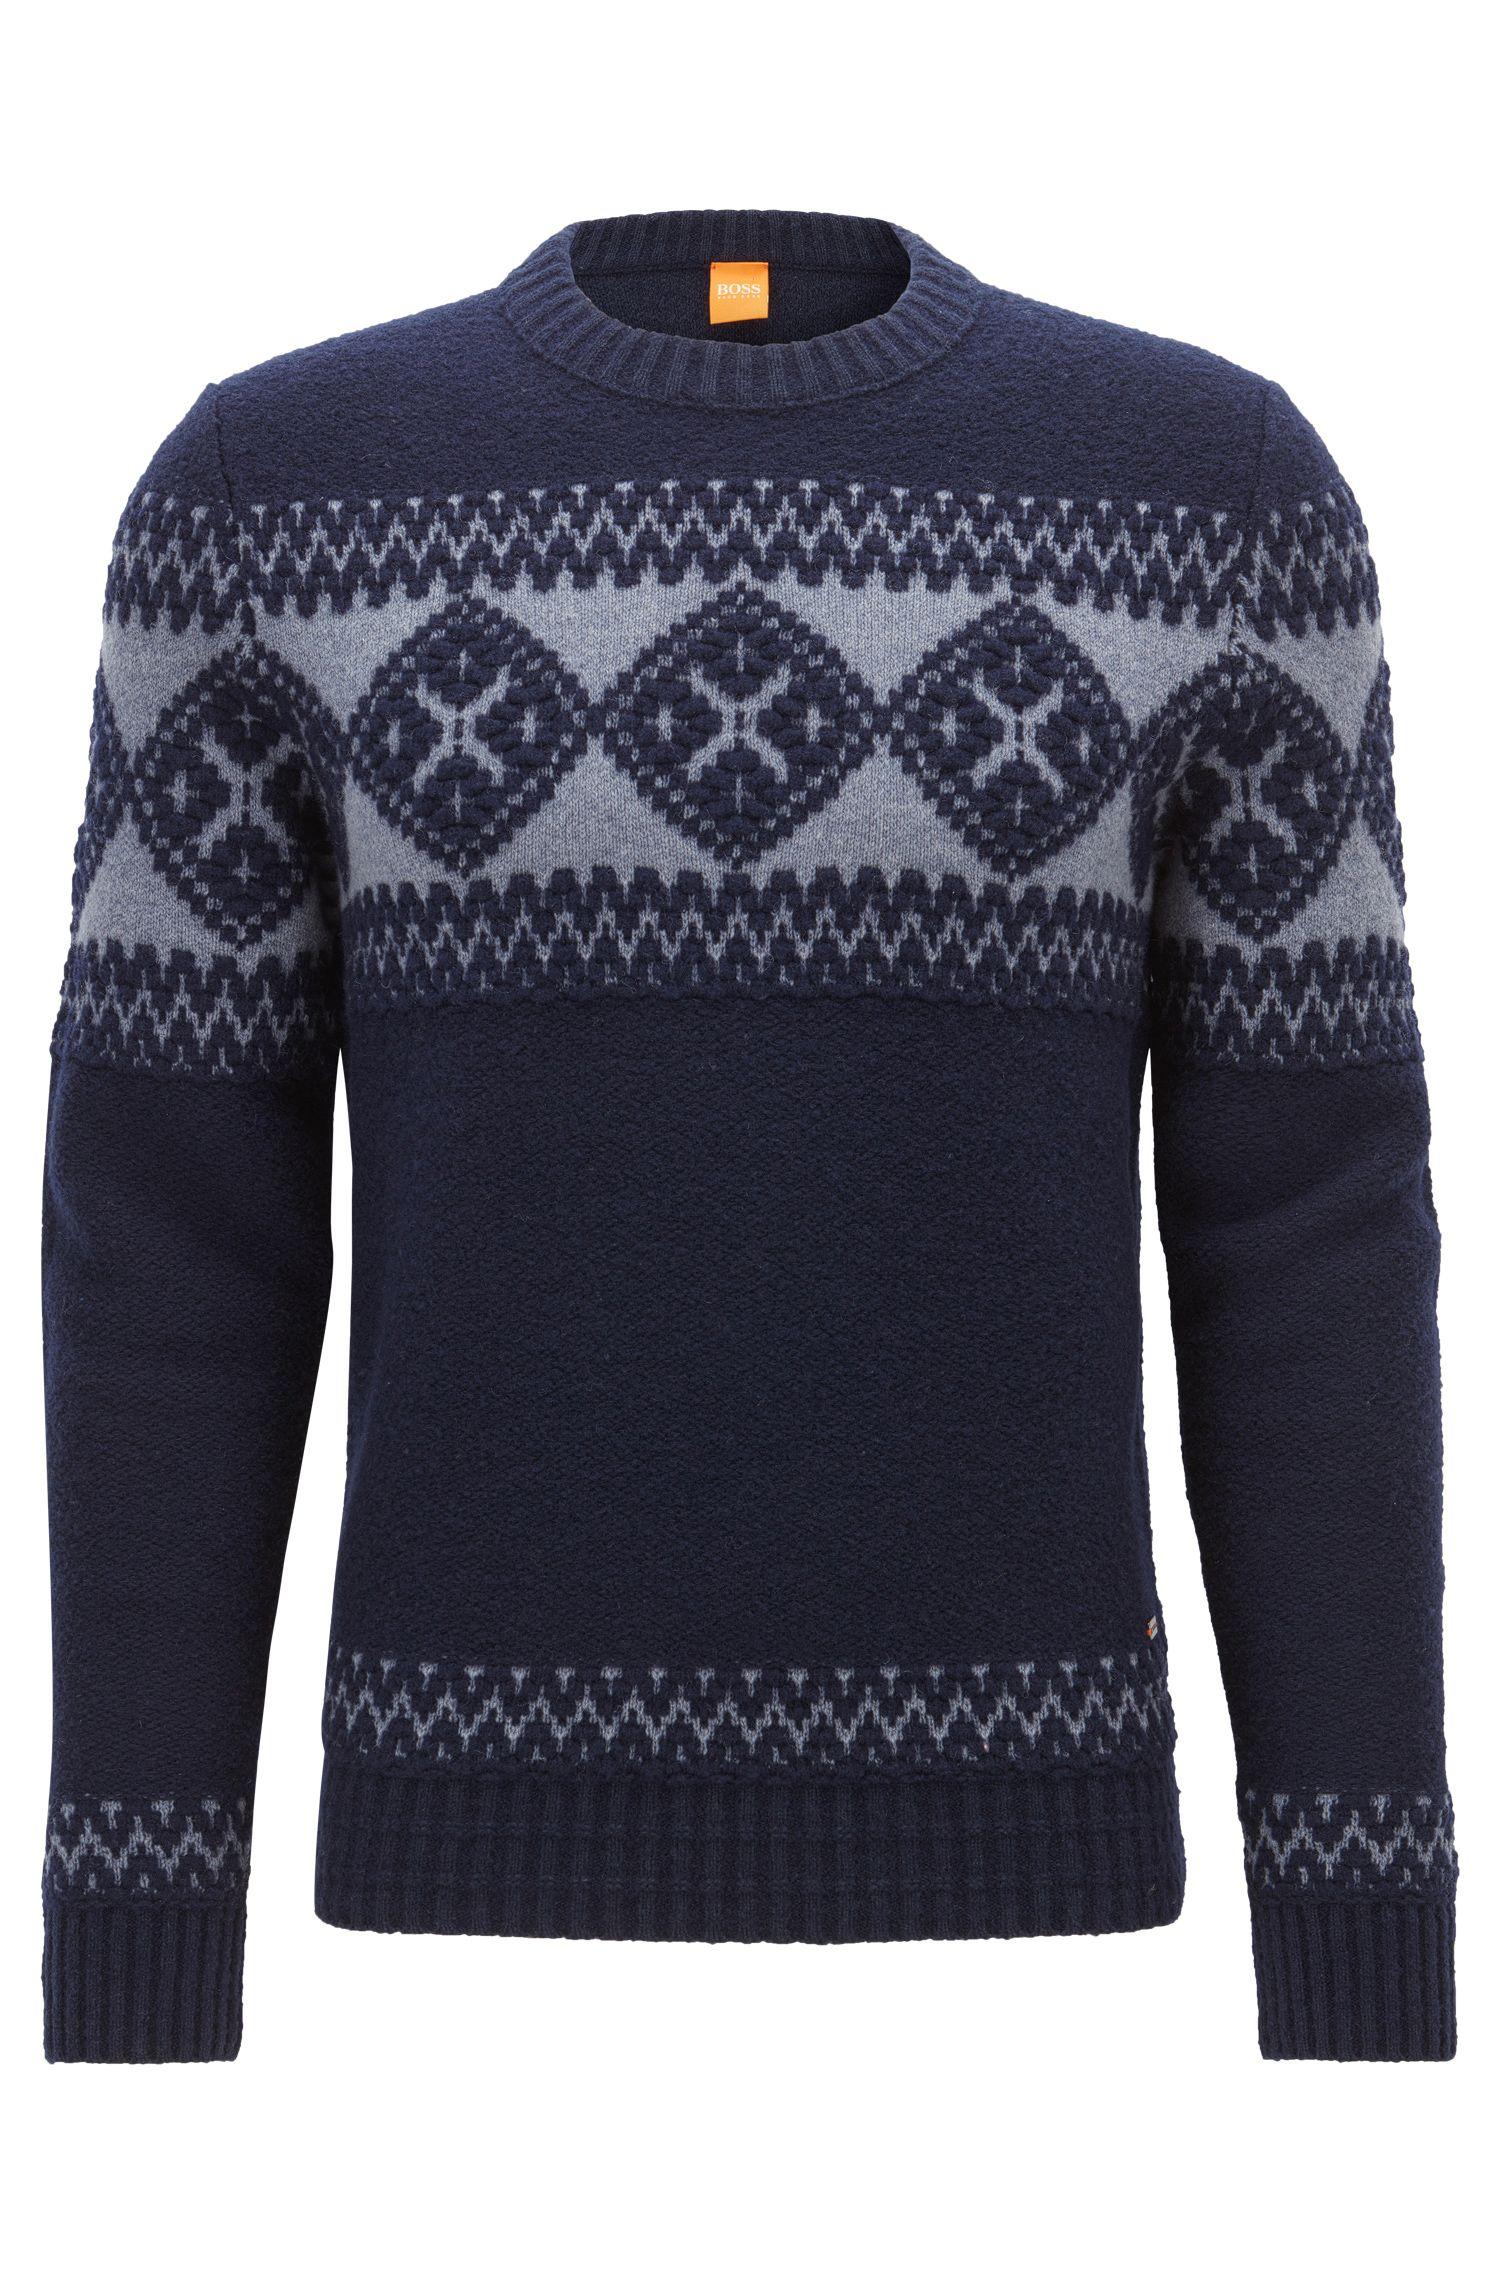 Virgin Wool Blend Fair Isle Sweater | Kionas